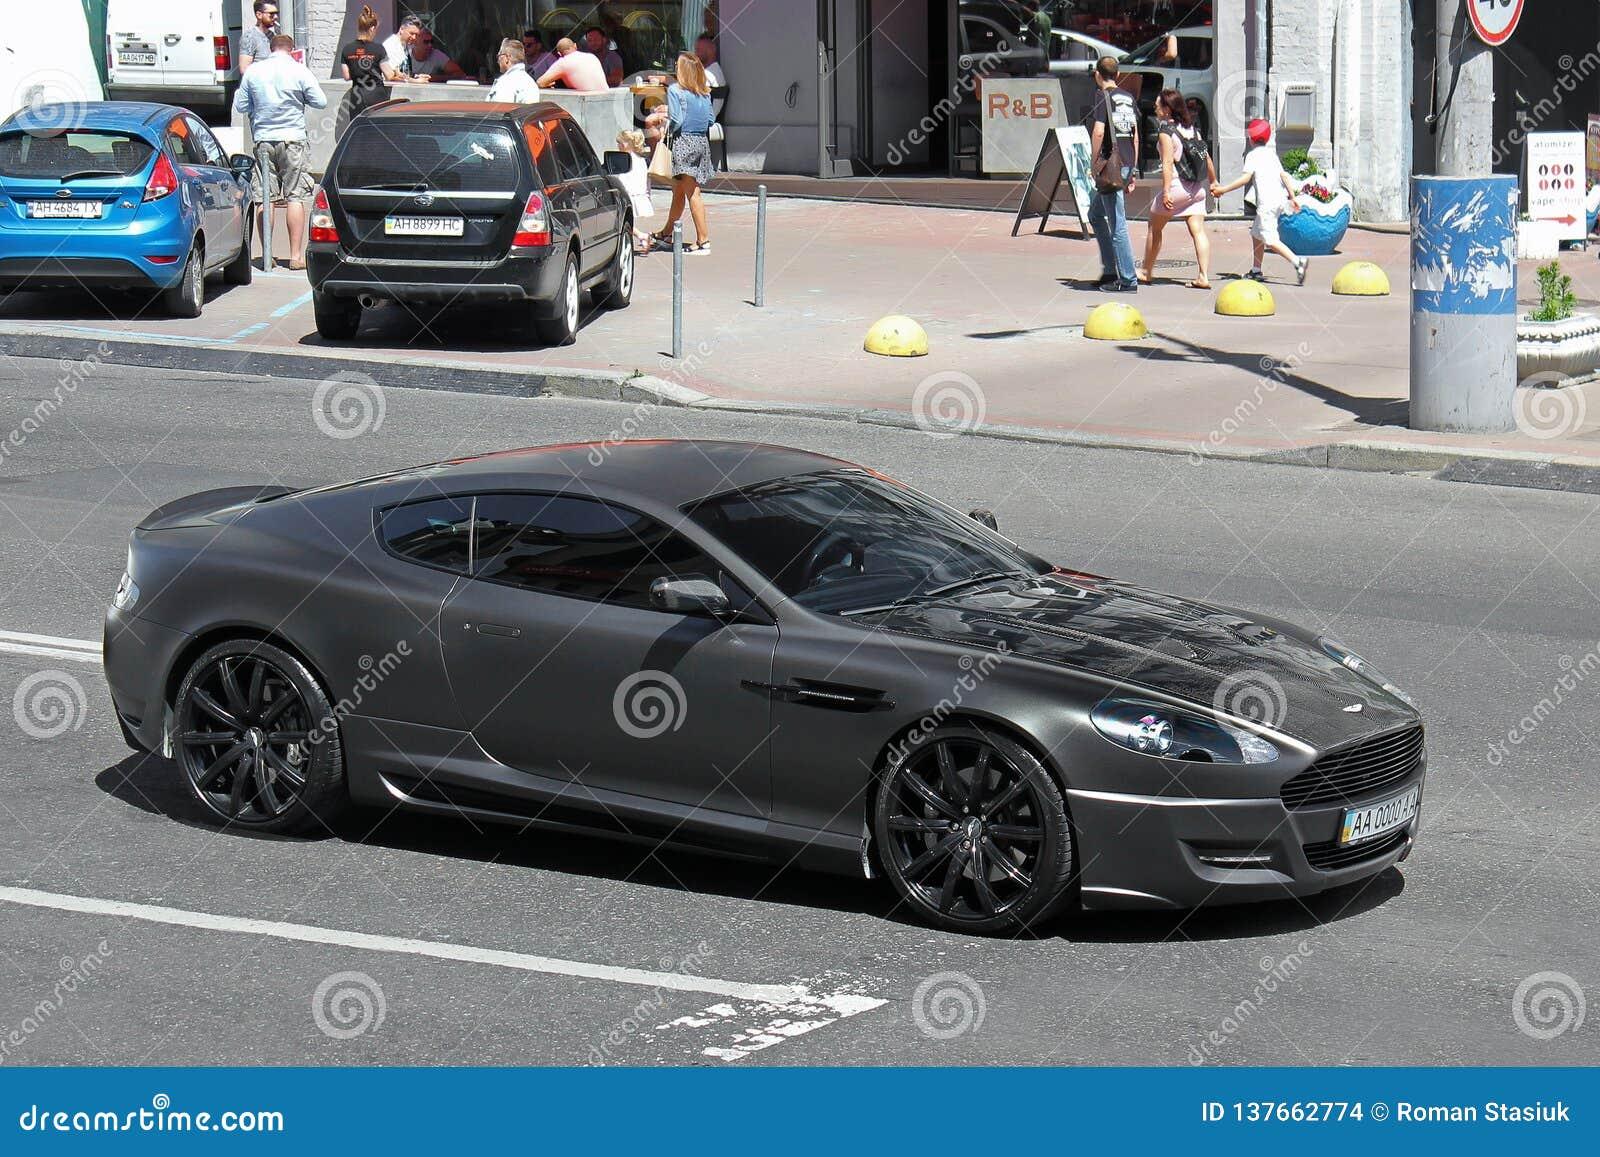 10 septembre 2013, Kiev, Ukraine Projet Kahn de Matt Aston Martin DBS sur la route à Kiev